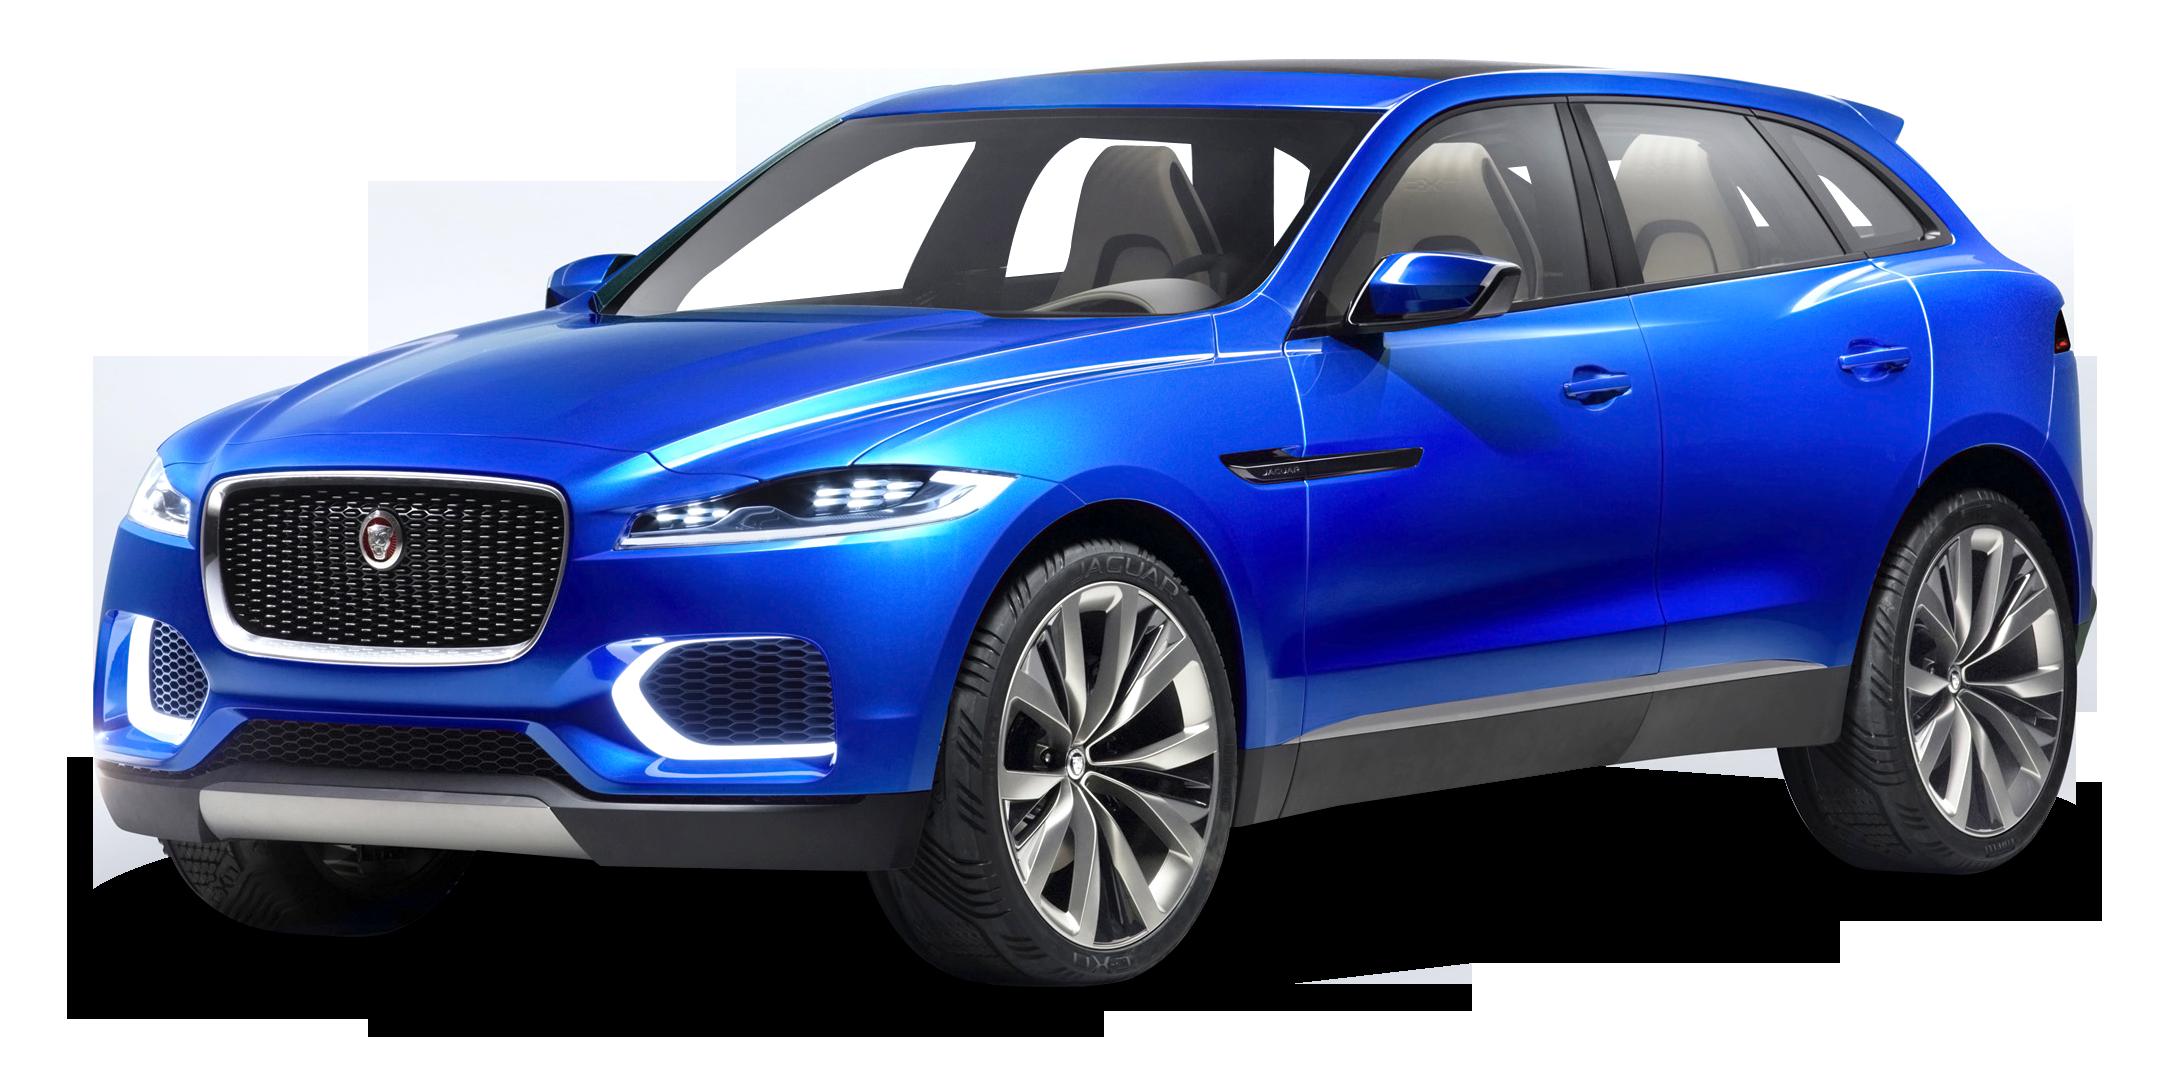 Blue Jaguar C X17 Sports Crossover Car